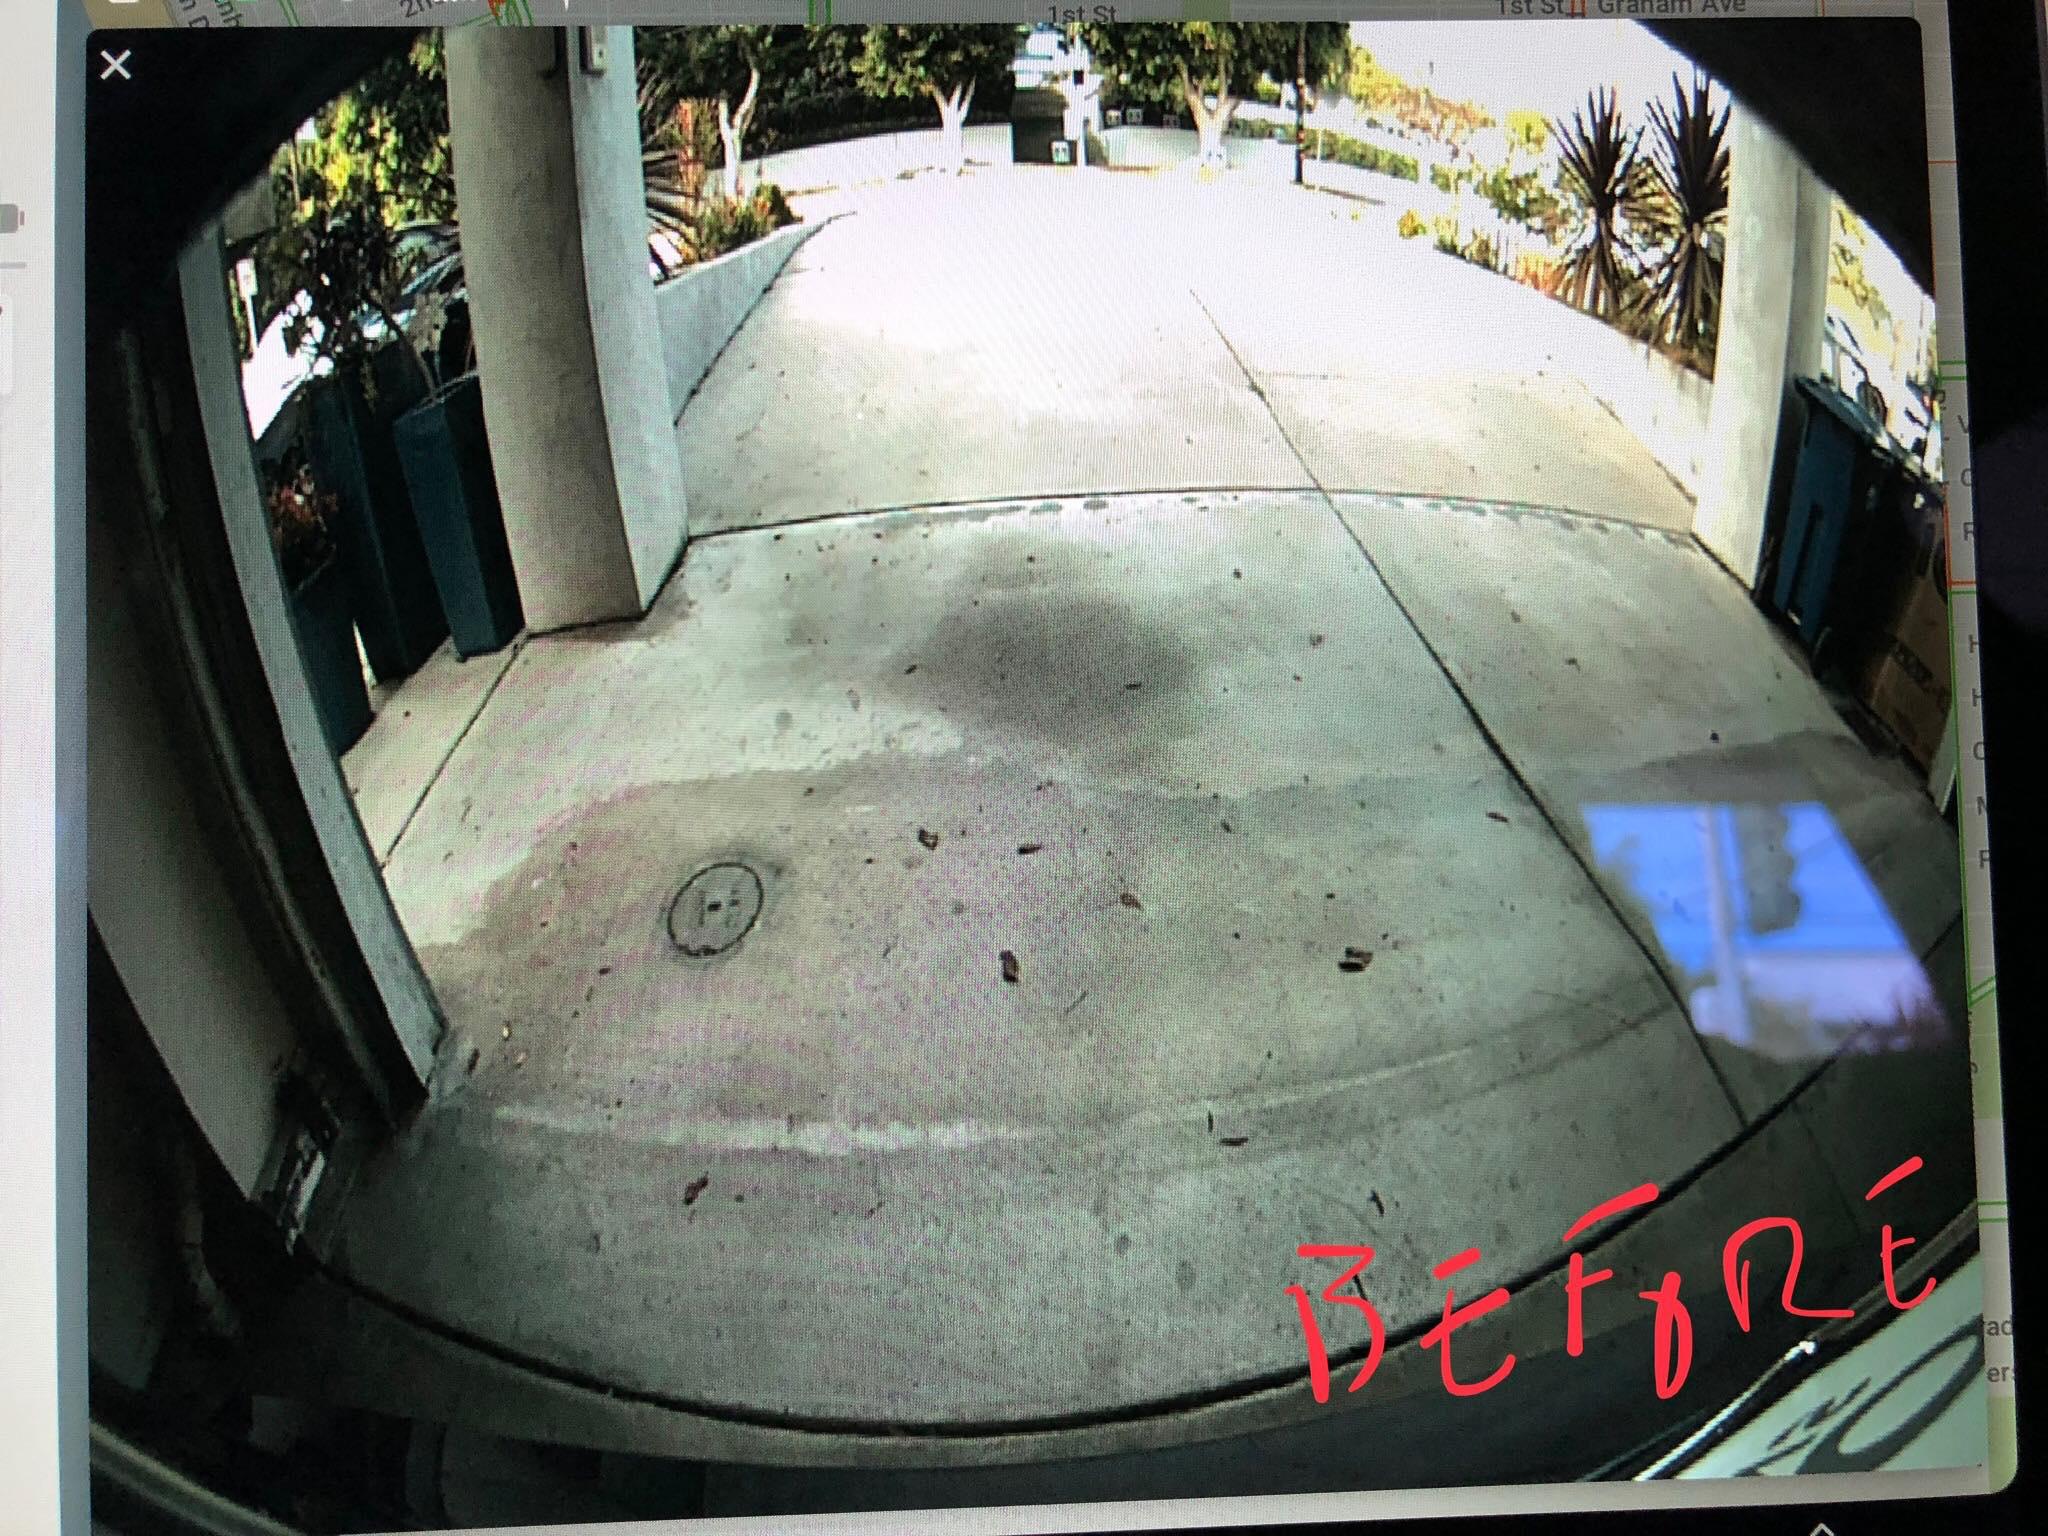 tesla-model-3-backup-camera-image-before